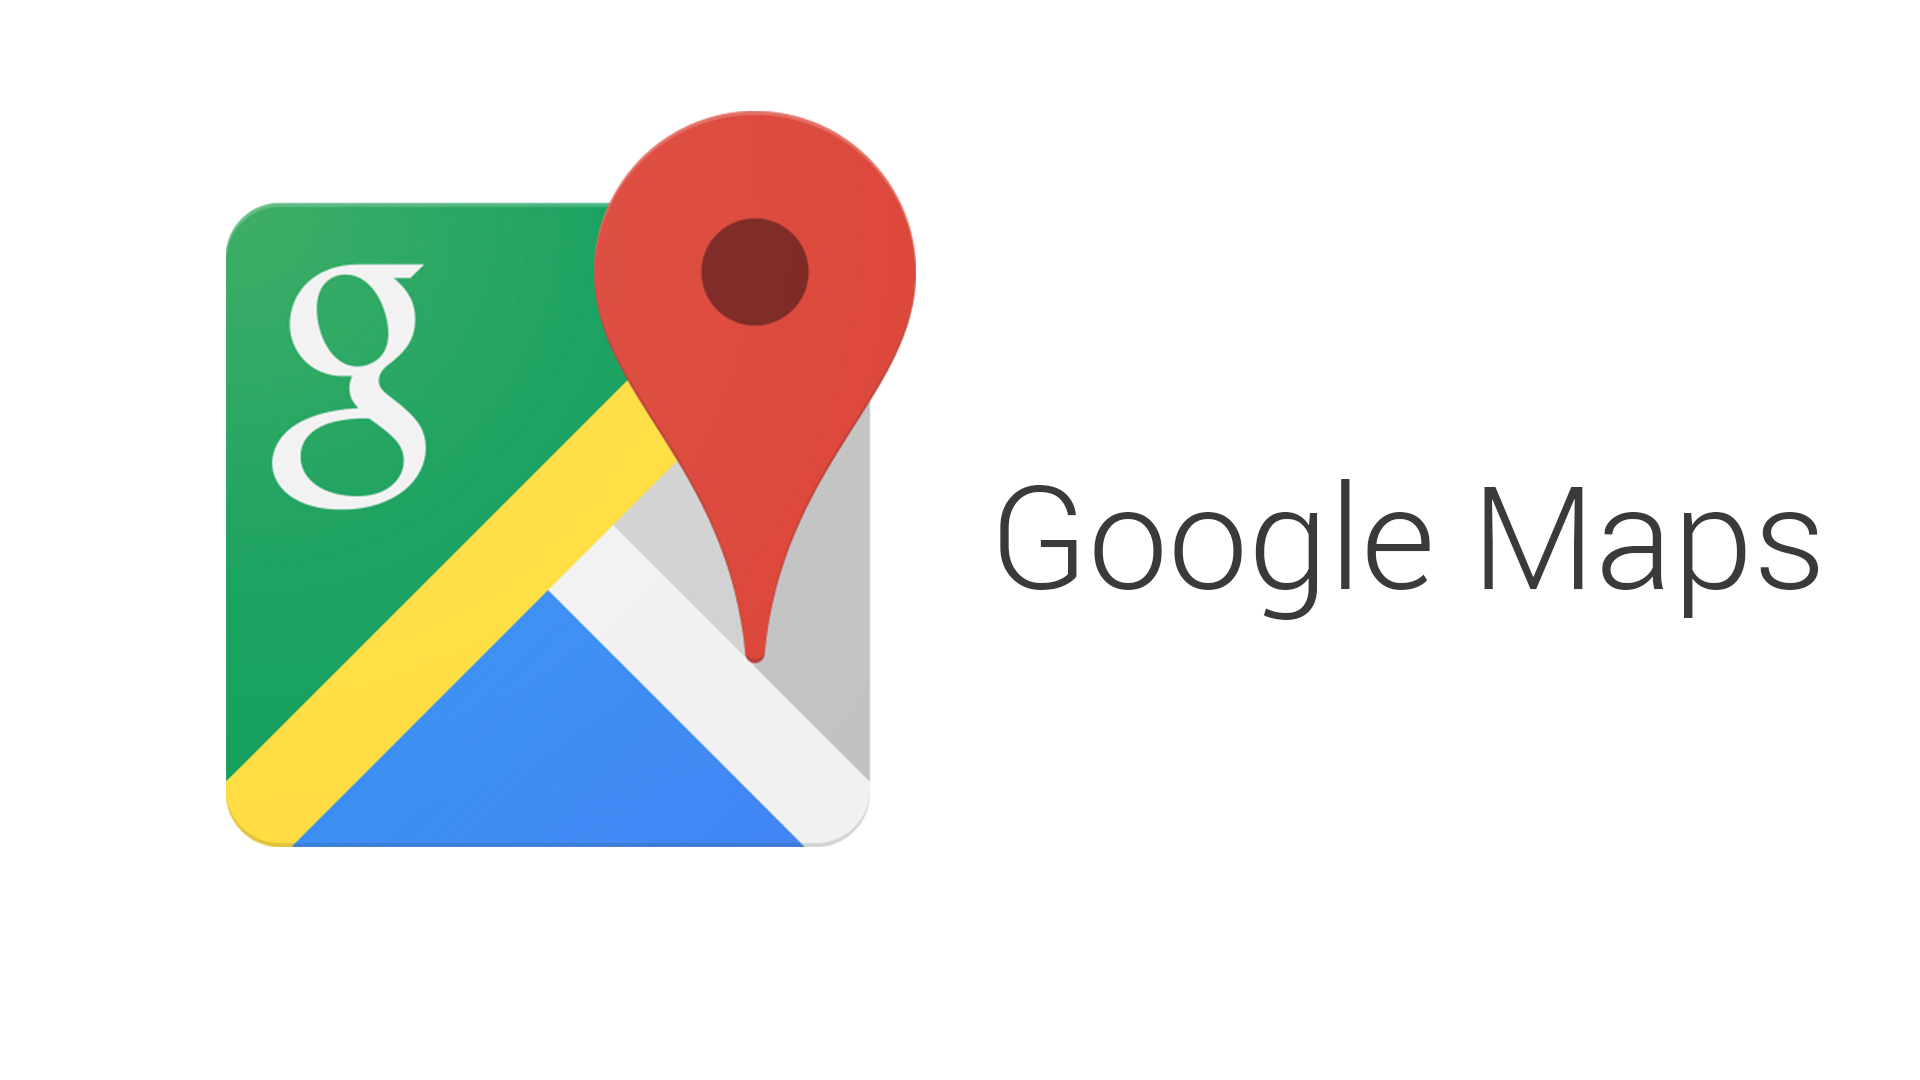 Google Maps viene passato ai video 2